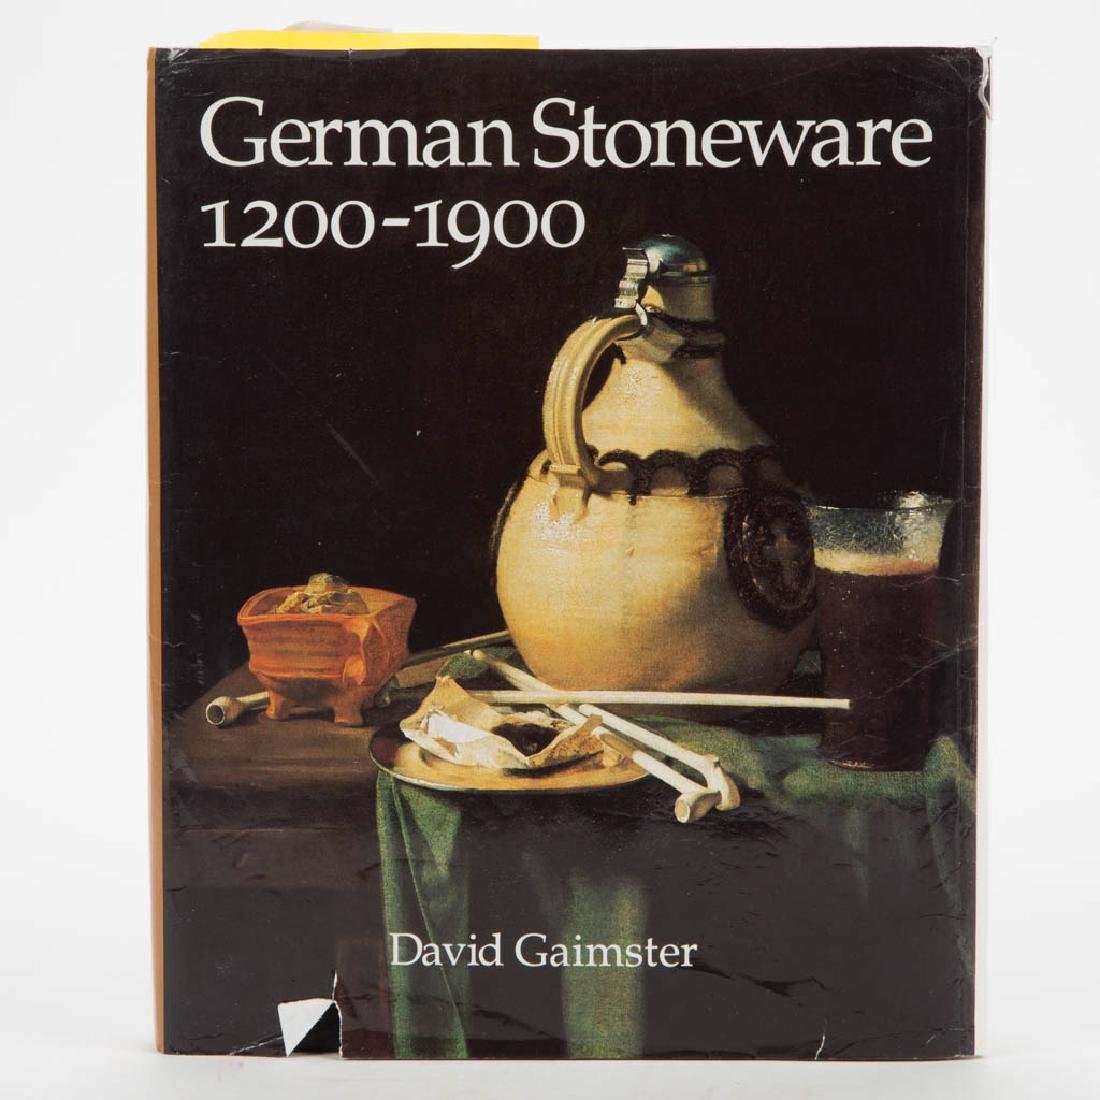 GERMAN STONEWARE GAIMSTER CERAMIC VOLUME